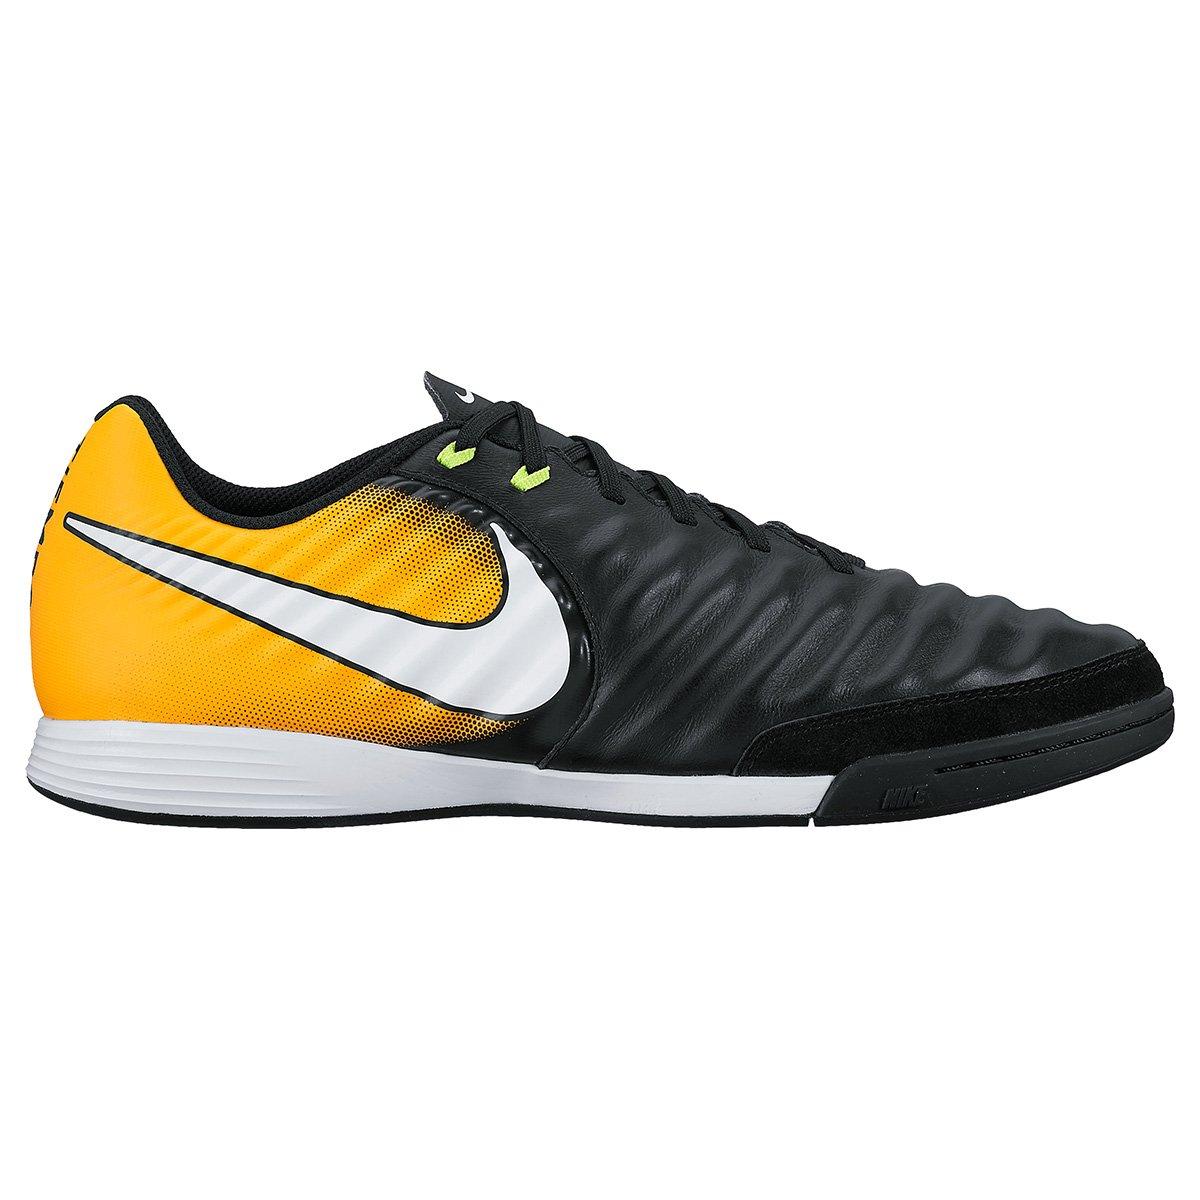 83bde8c582 Chuteira Futsal Nike Tiempo Ligera 4 IC - Preto e Laranja